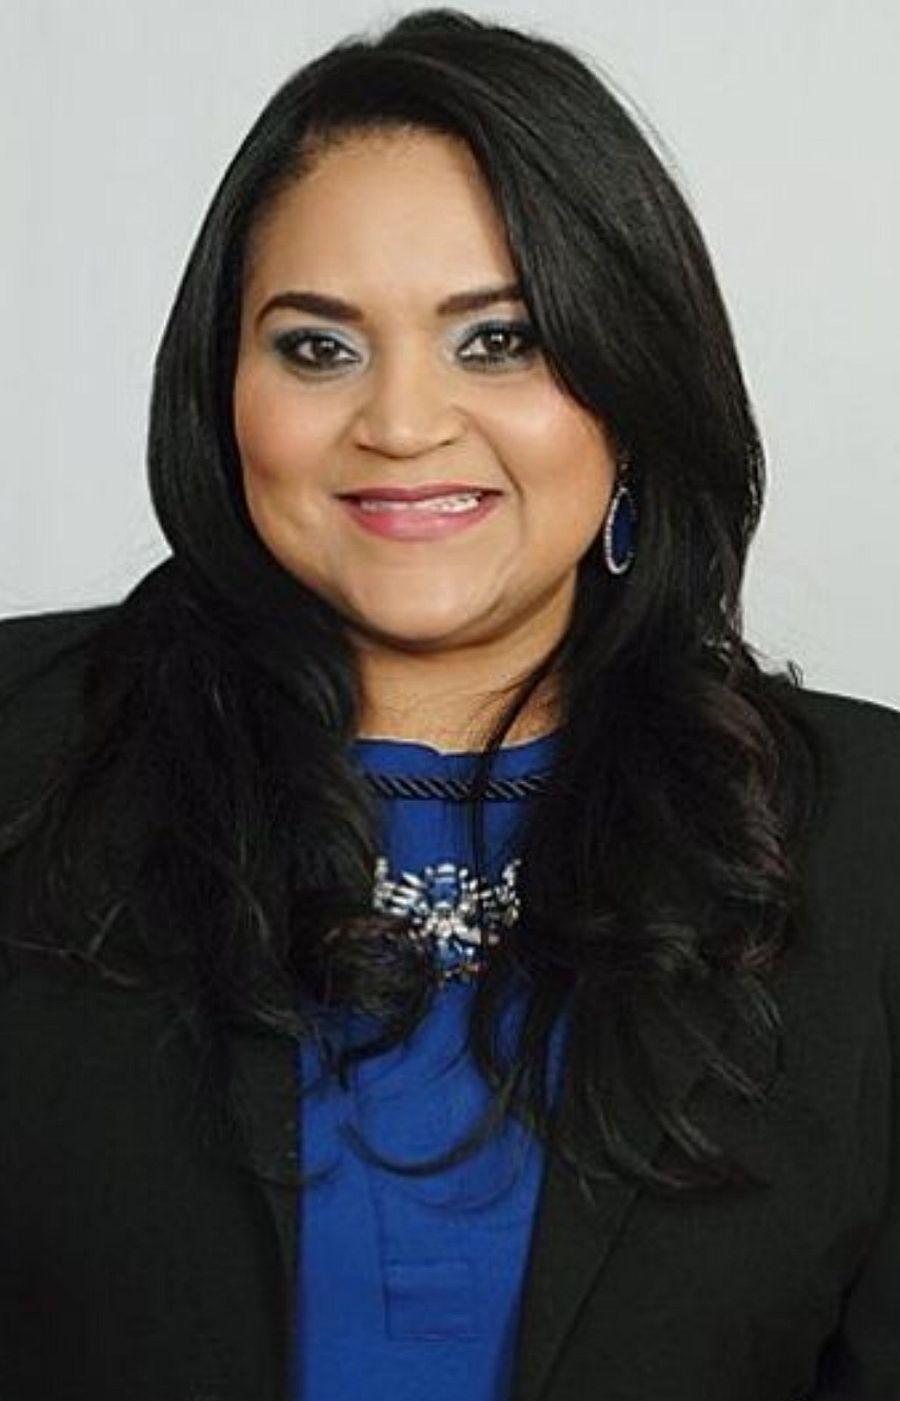 GUILLERMINA MARTINEZ Financial Professional & Insurance Agent